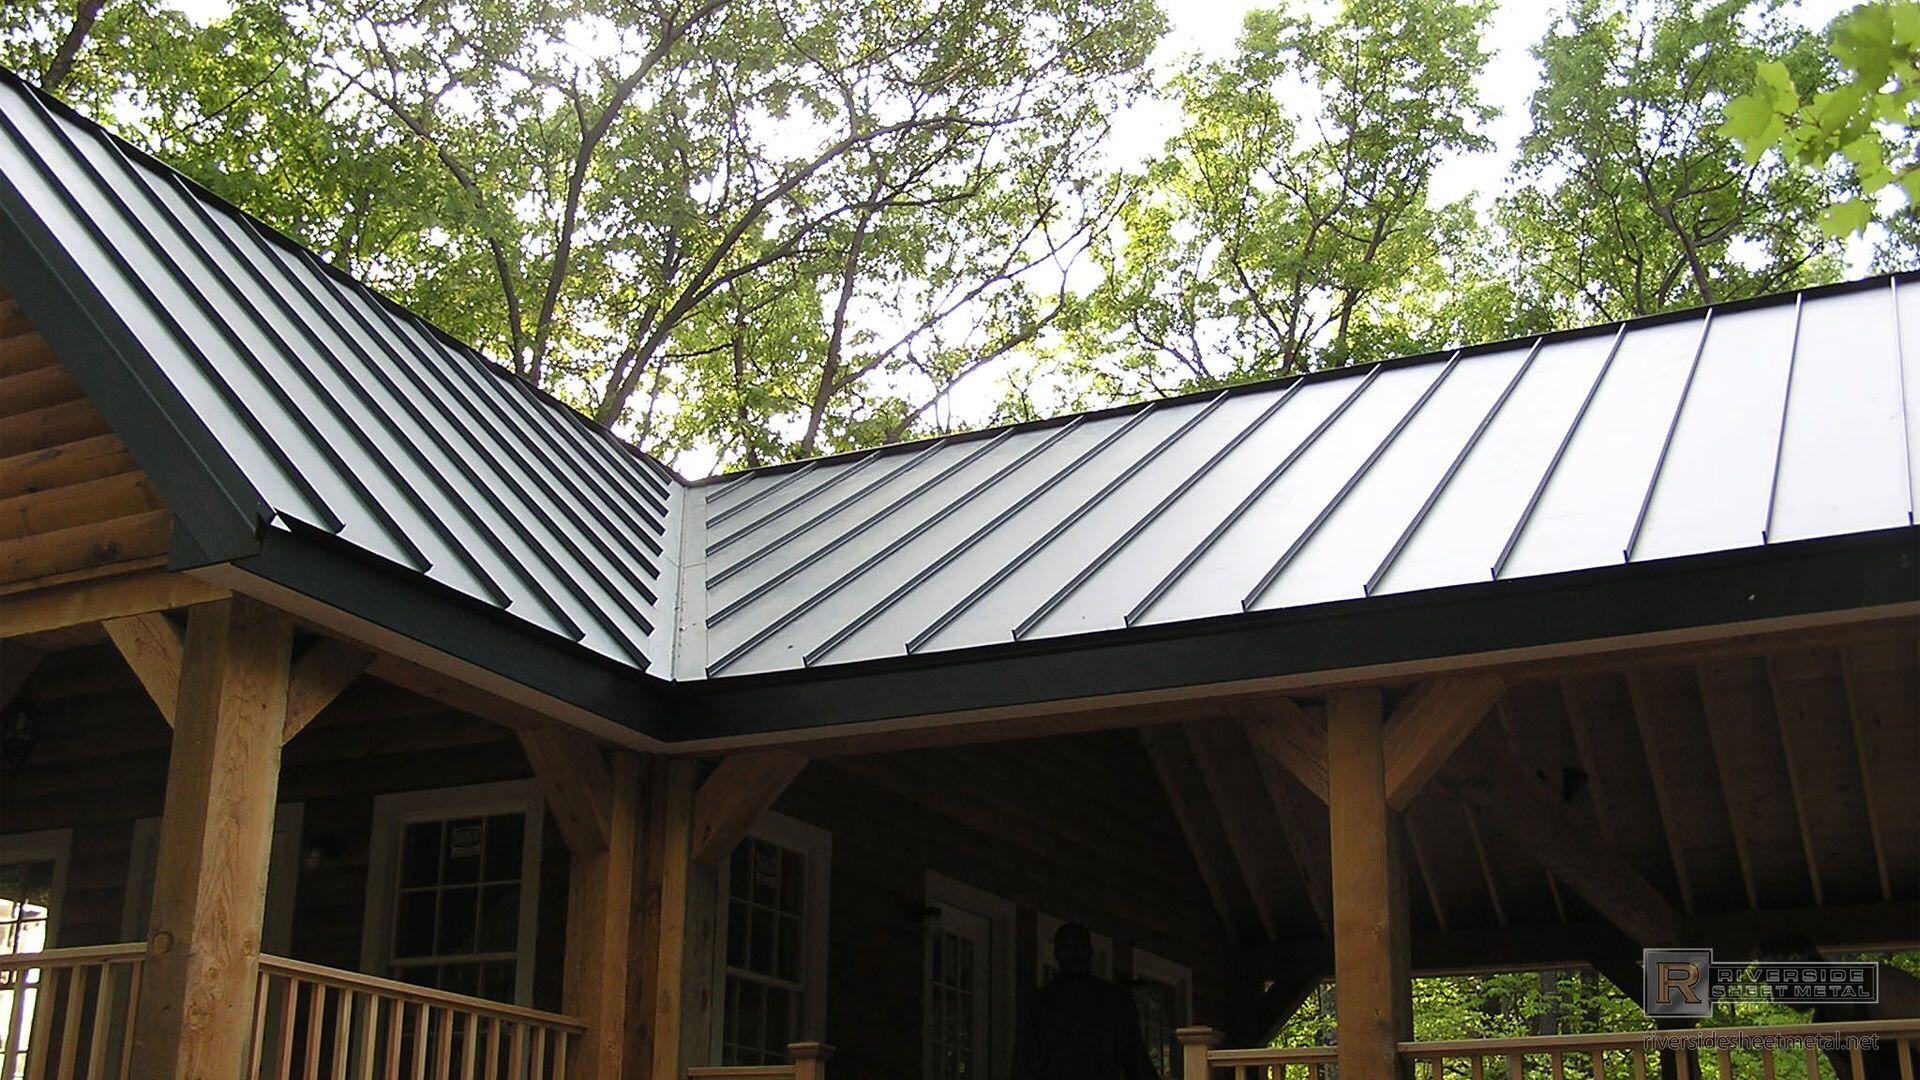 Charcoal Gray Standing Seam Metal Roof Metal Roof Metal Roof Cost Roof Design